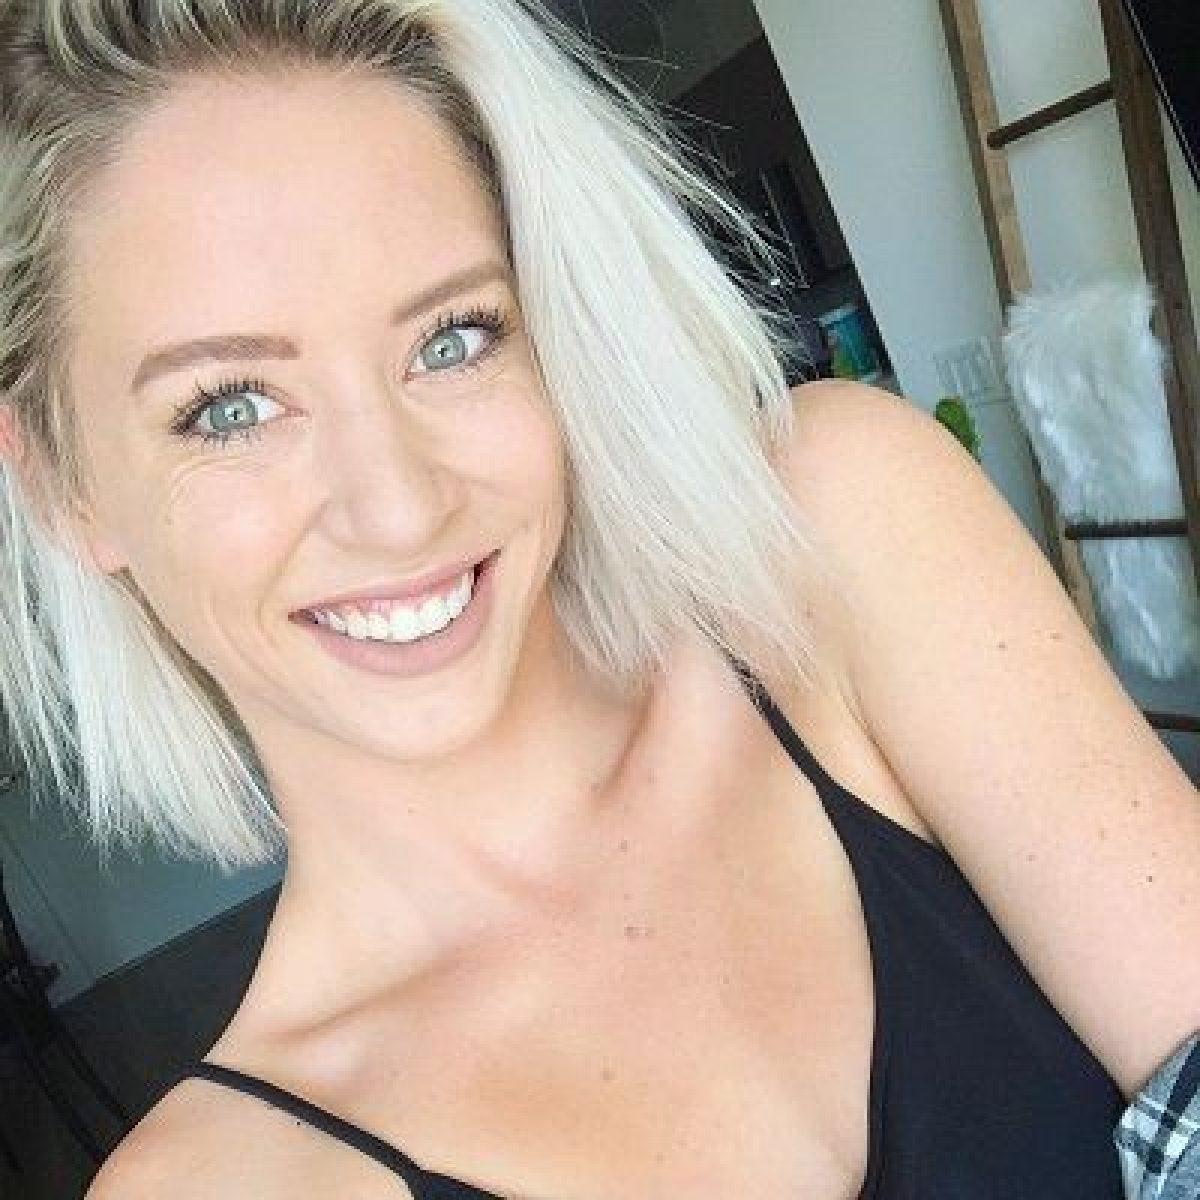 Lily Marston - Bio, Age, Net Worth, Height, Single, Nationality, Body Measurement, Career